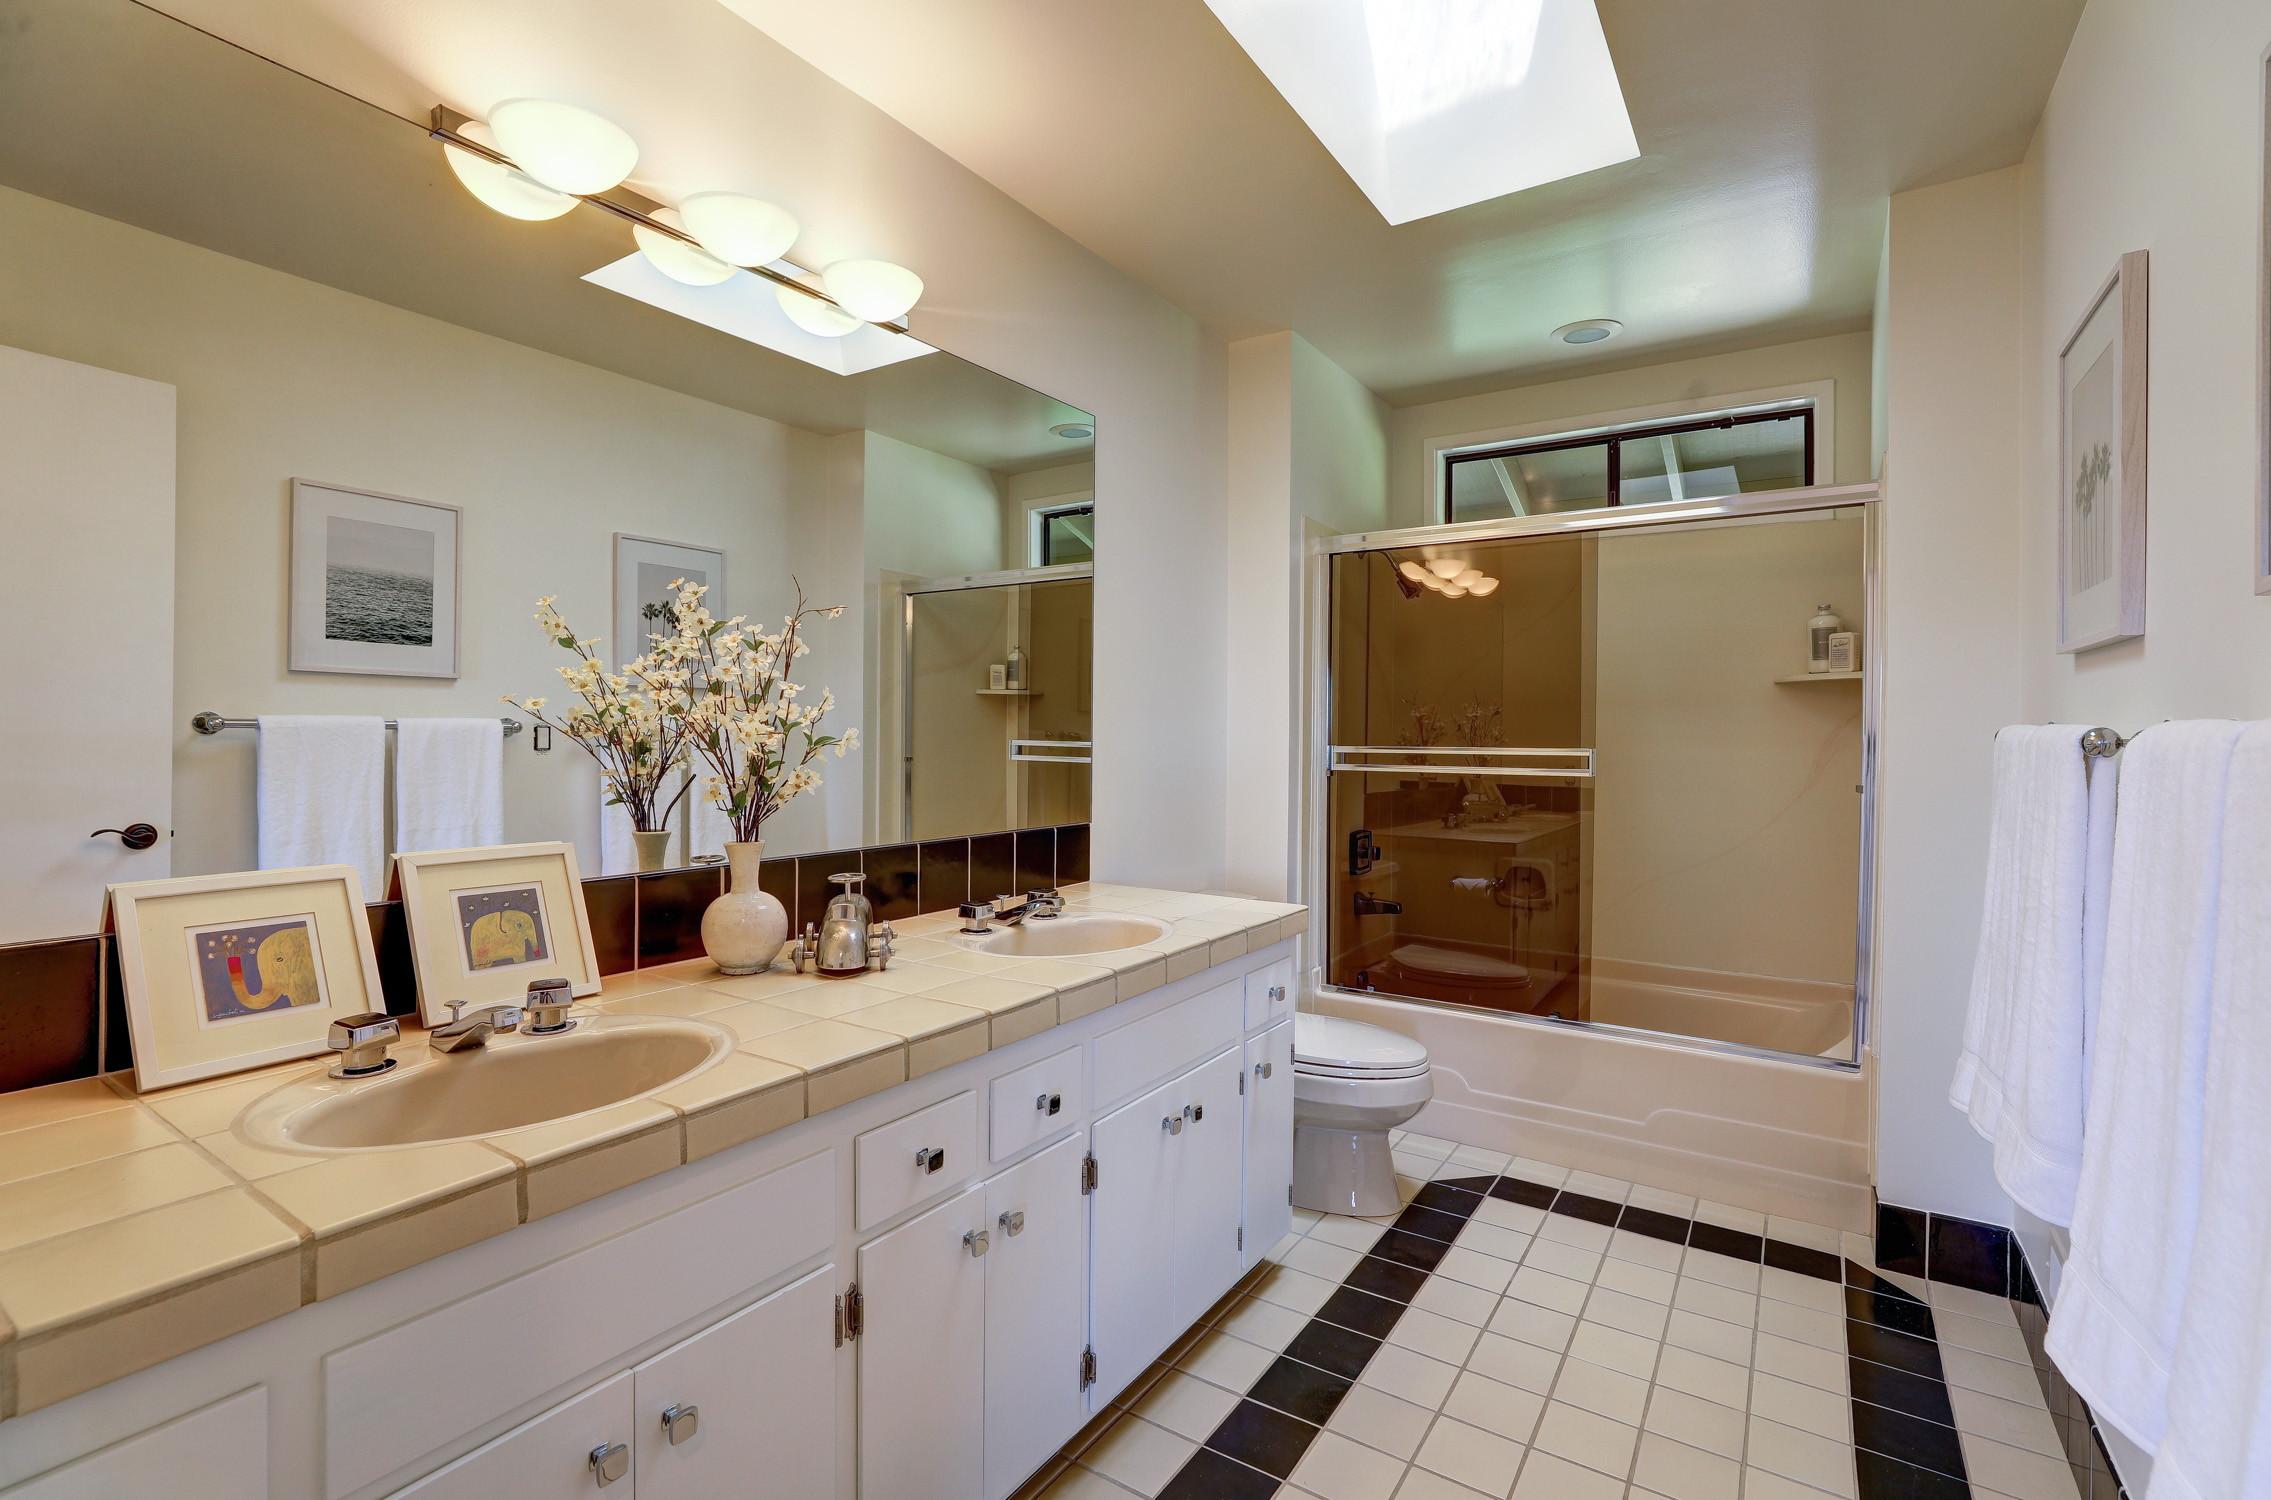 16Dorian 51 MLSSan Rafael Real Estate - Listed by Julia Fitzpatrick + Allie Fornesi Team Own Marin County .jpg